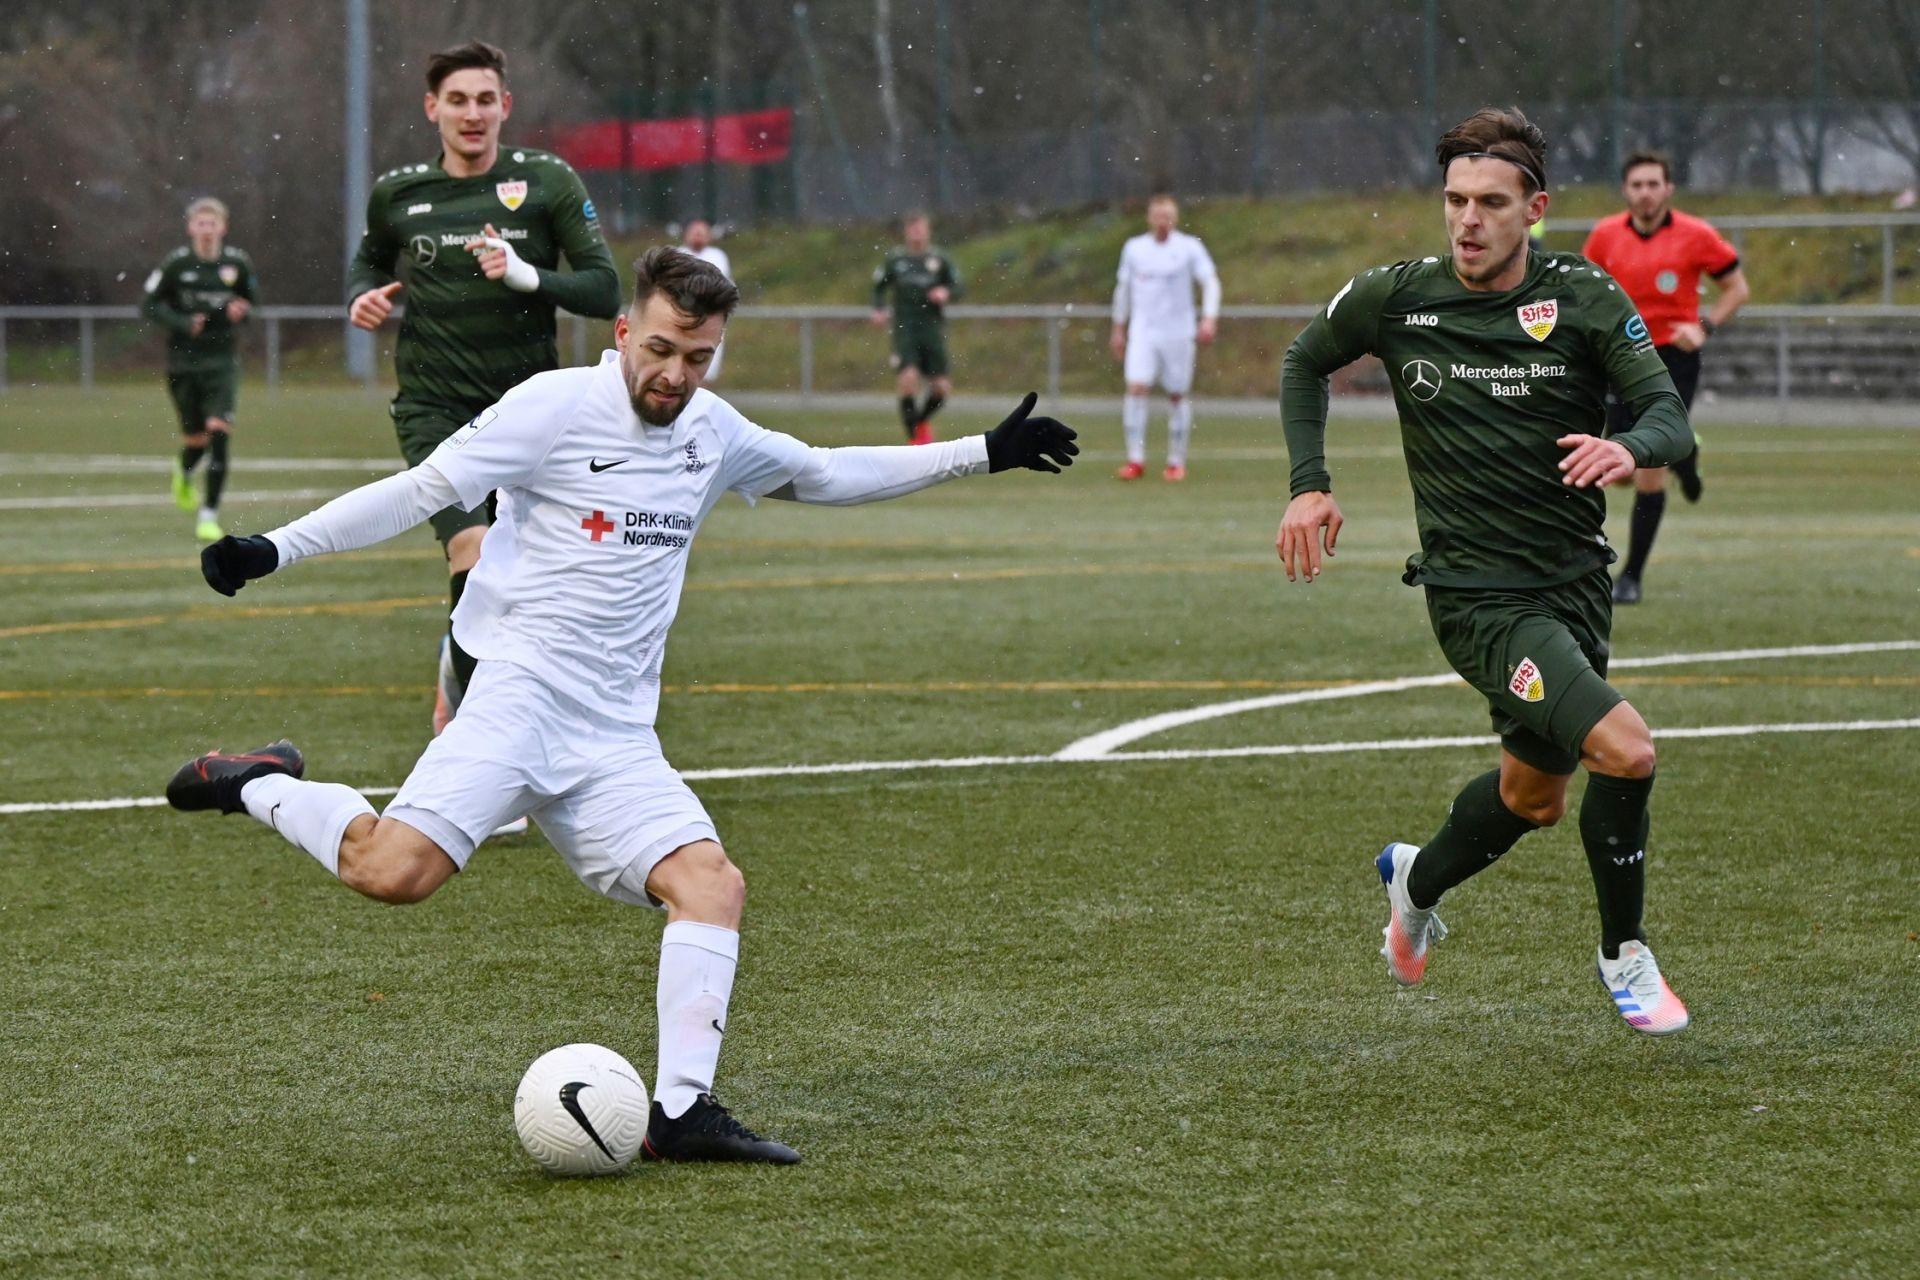 Regionalliga Südwest 2020/21, KSV Hessen Kassel, VfB Stuttgart II, Endstand 0:4, Marco Dawid